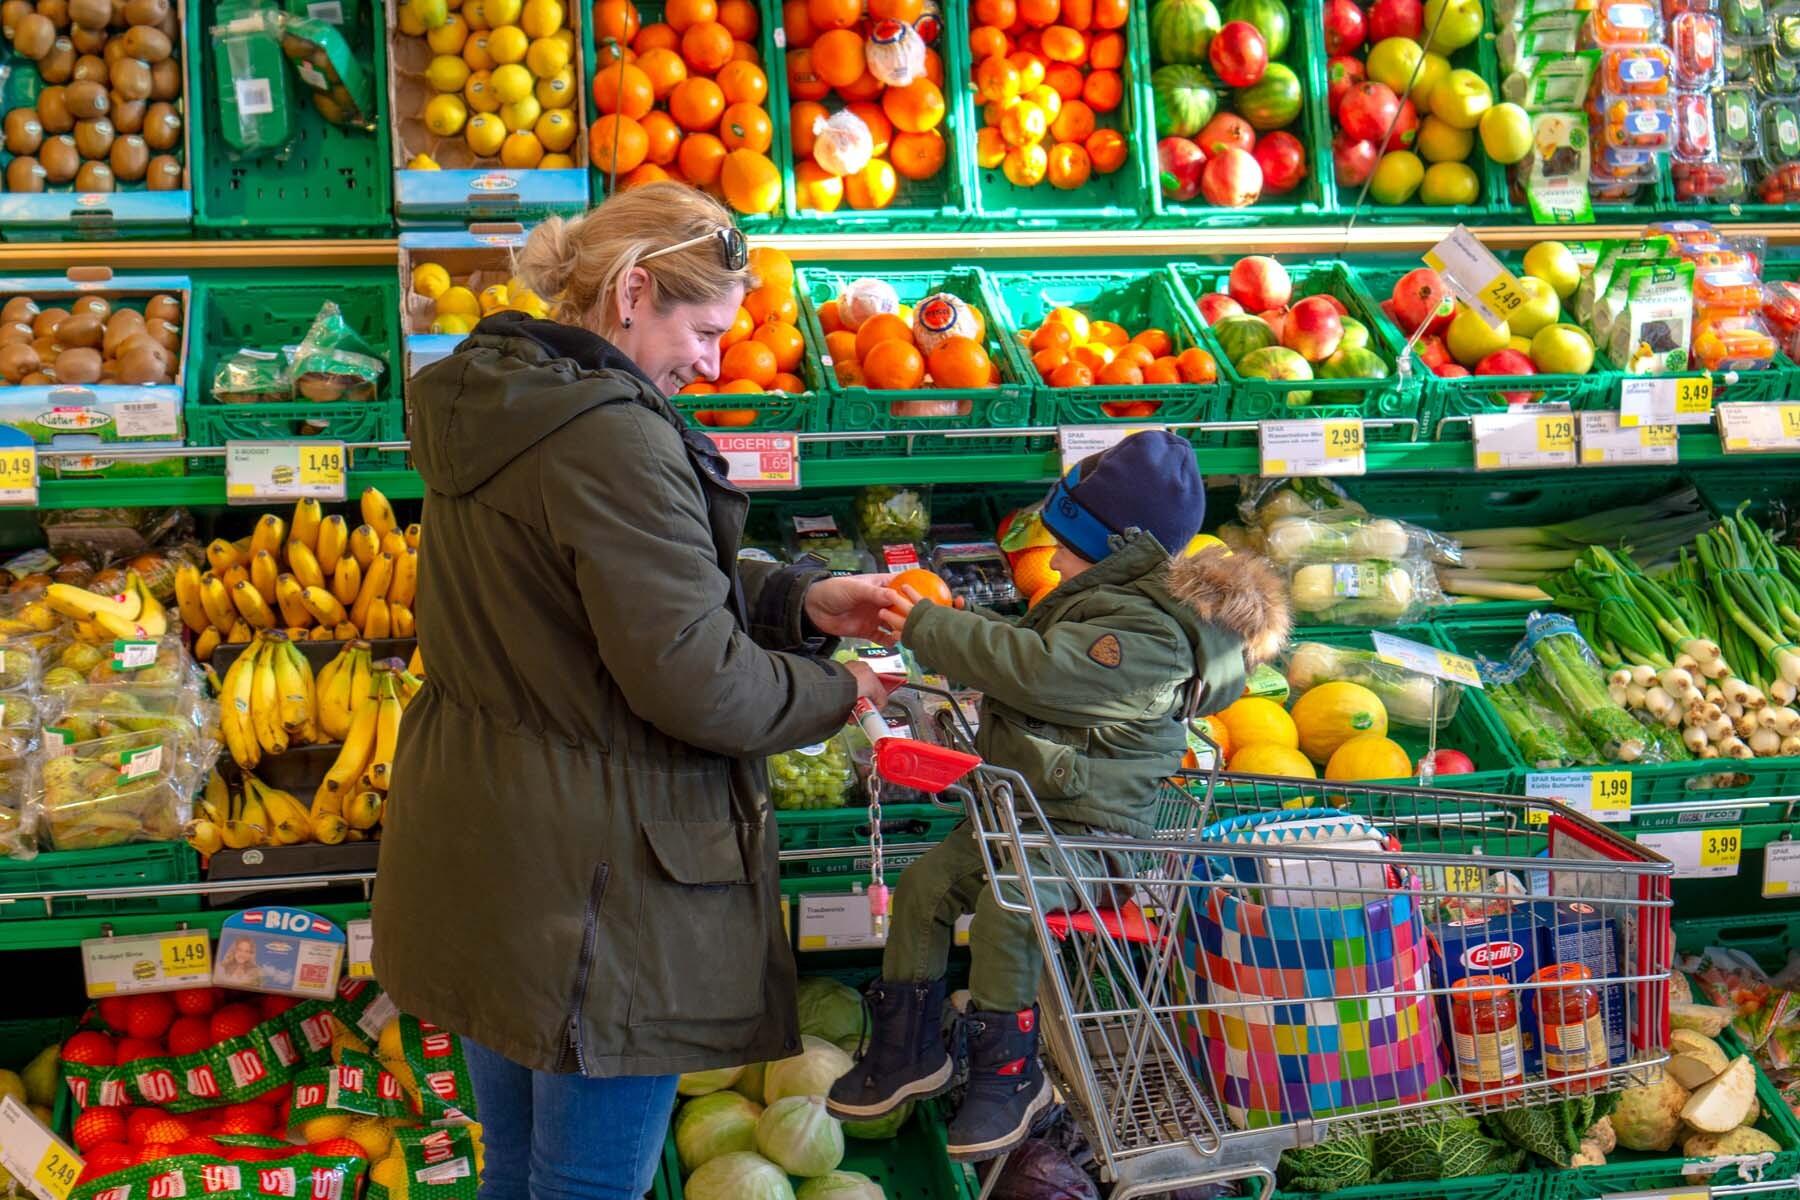 woman pushing child in shopping cart